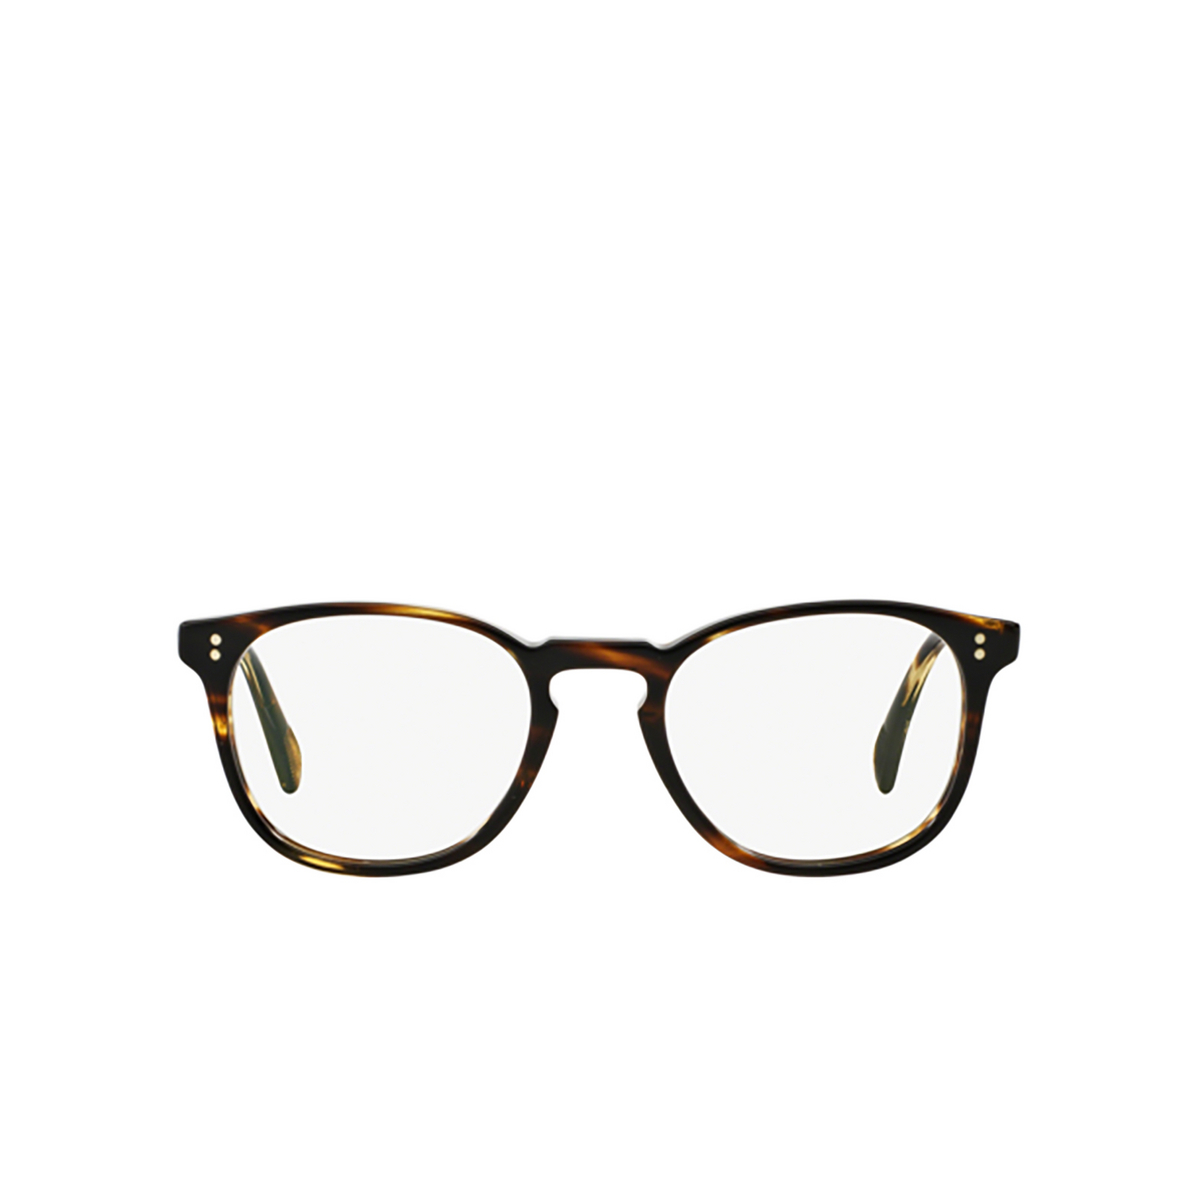 Oliver Peoples® Round Eyeglasses: Finley Esq. (u) OV5298U color Cocobolo 1003.